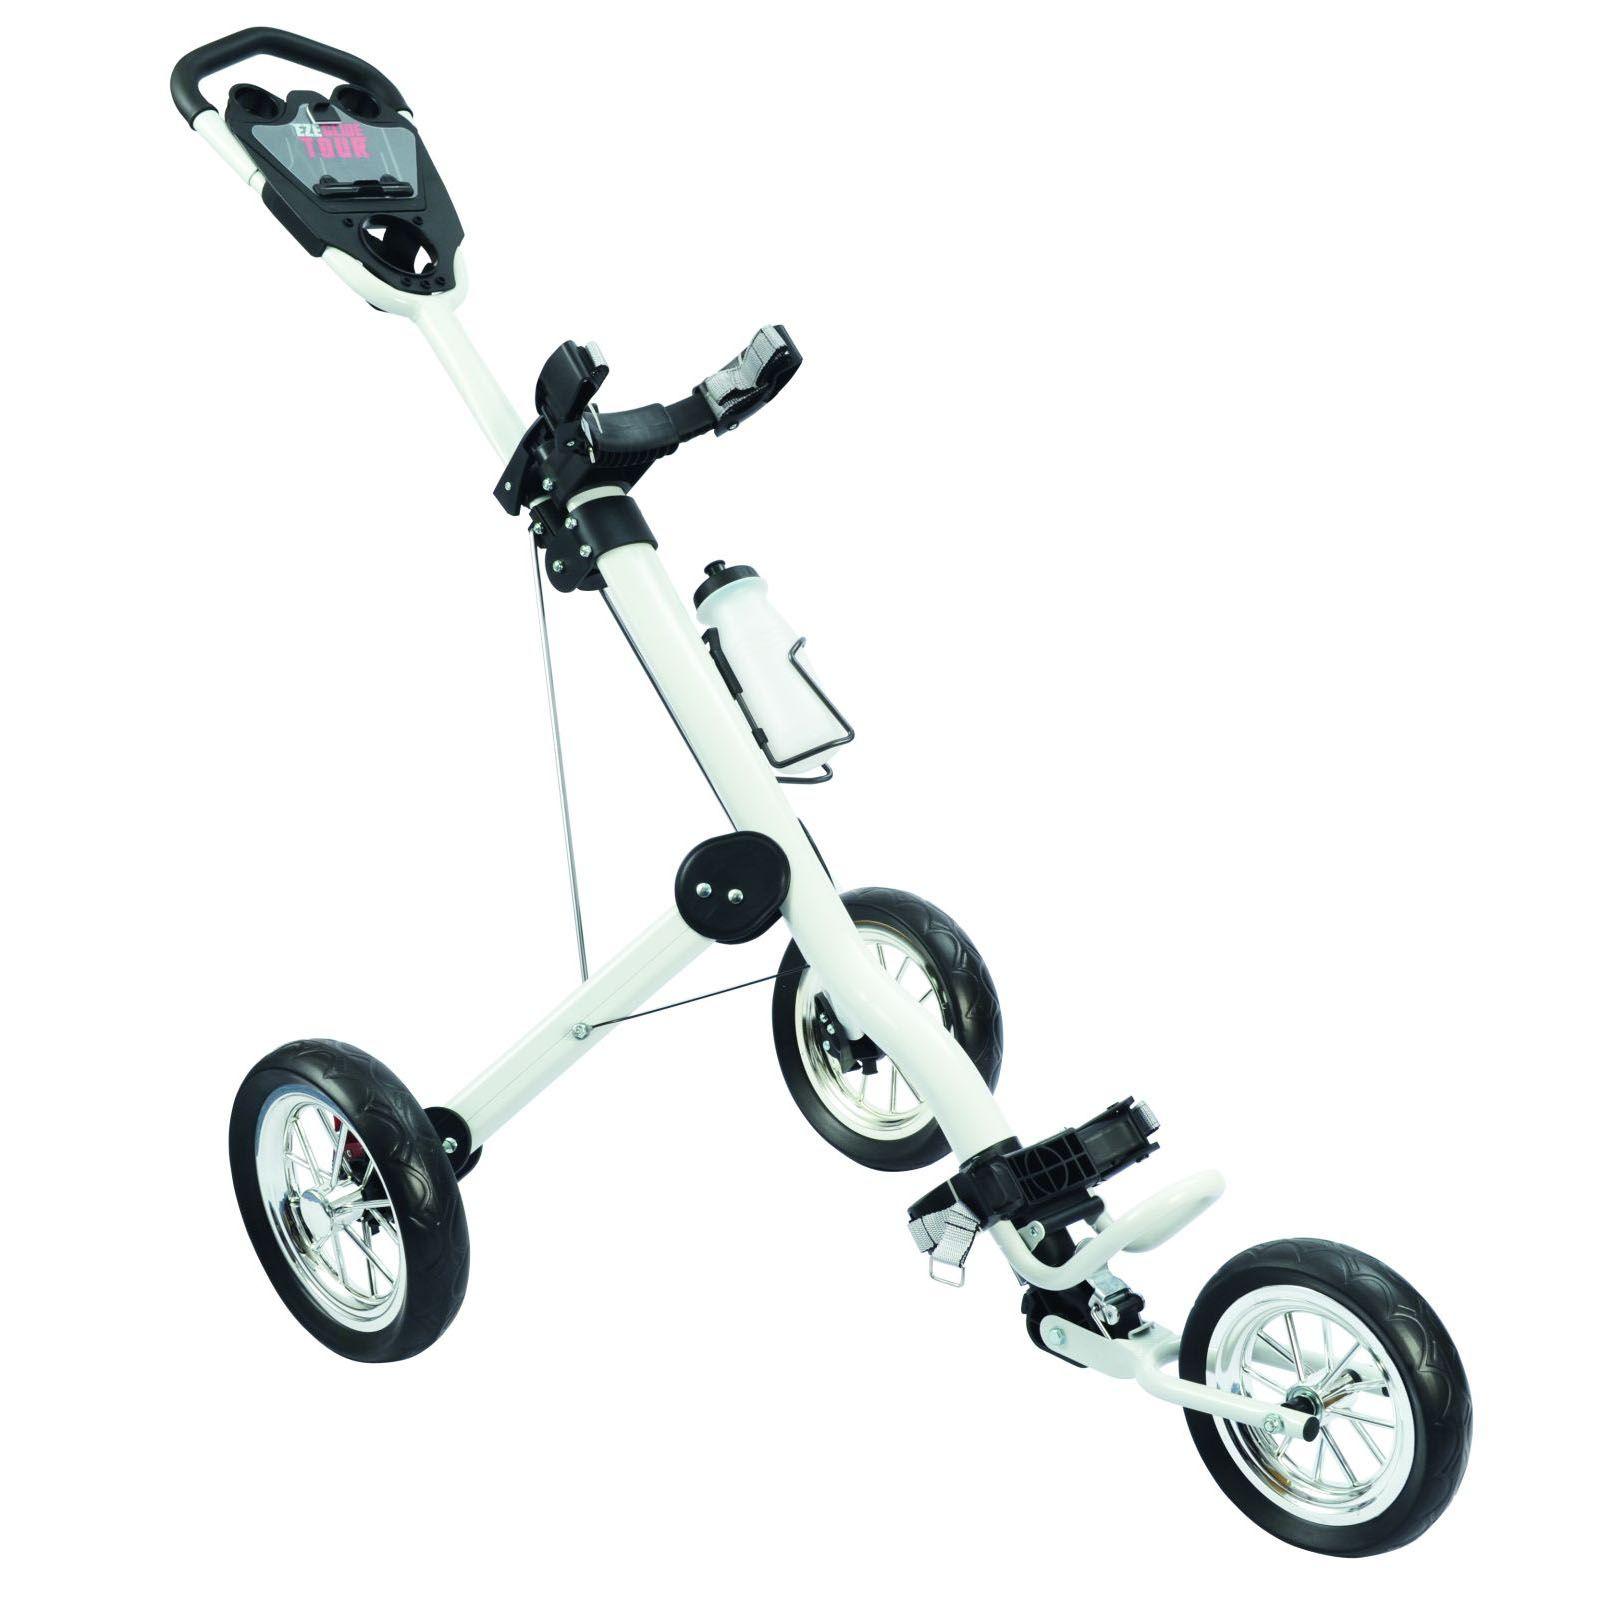 eze glide tour golf trolley